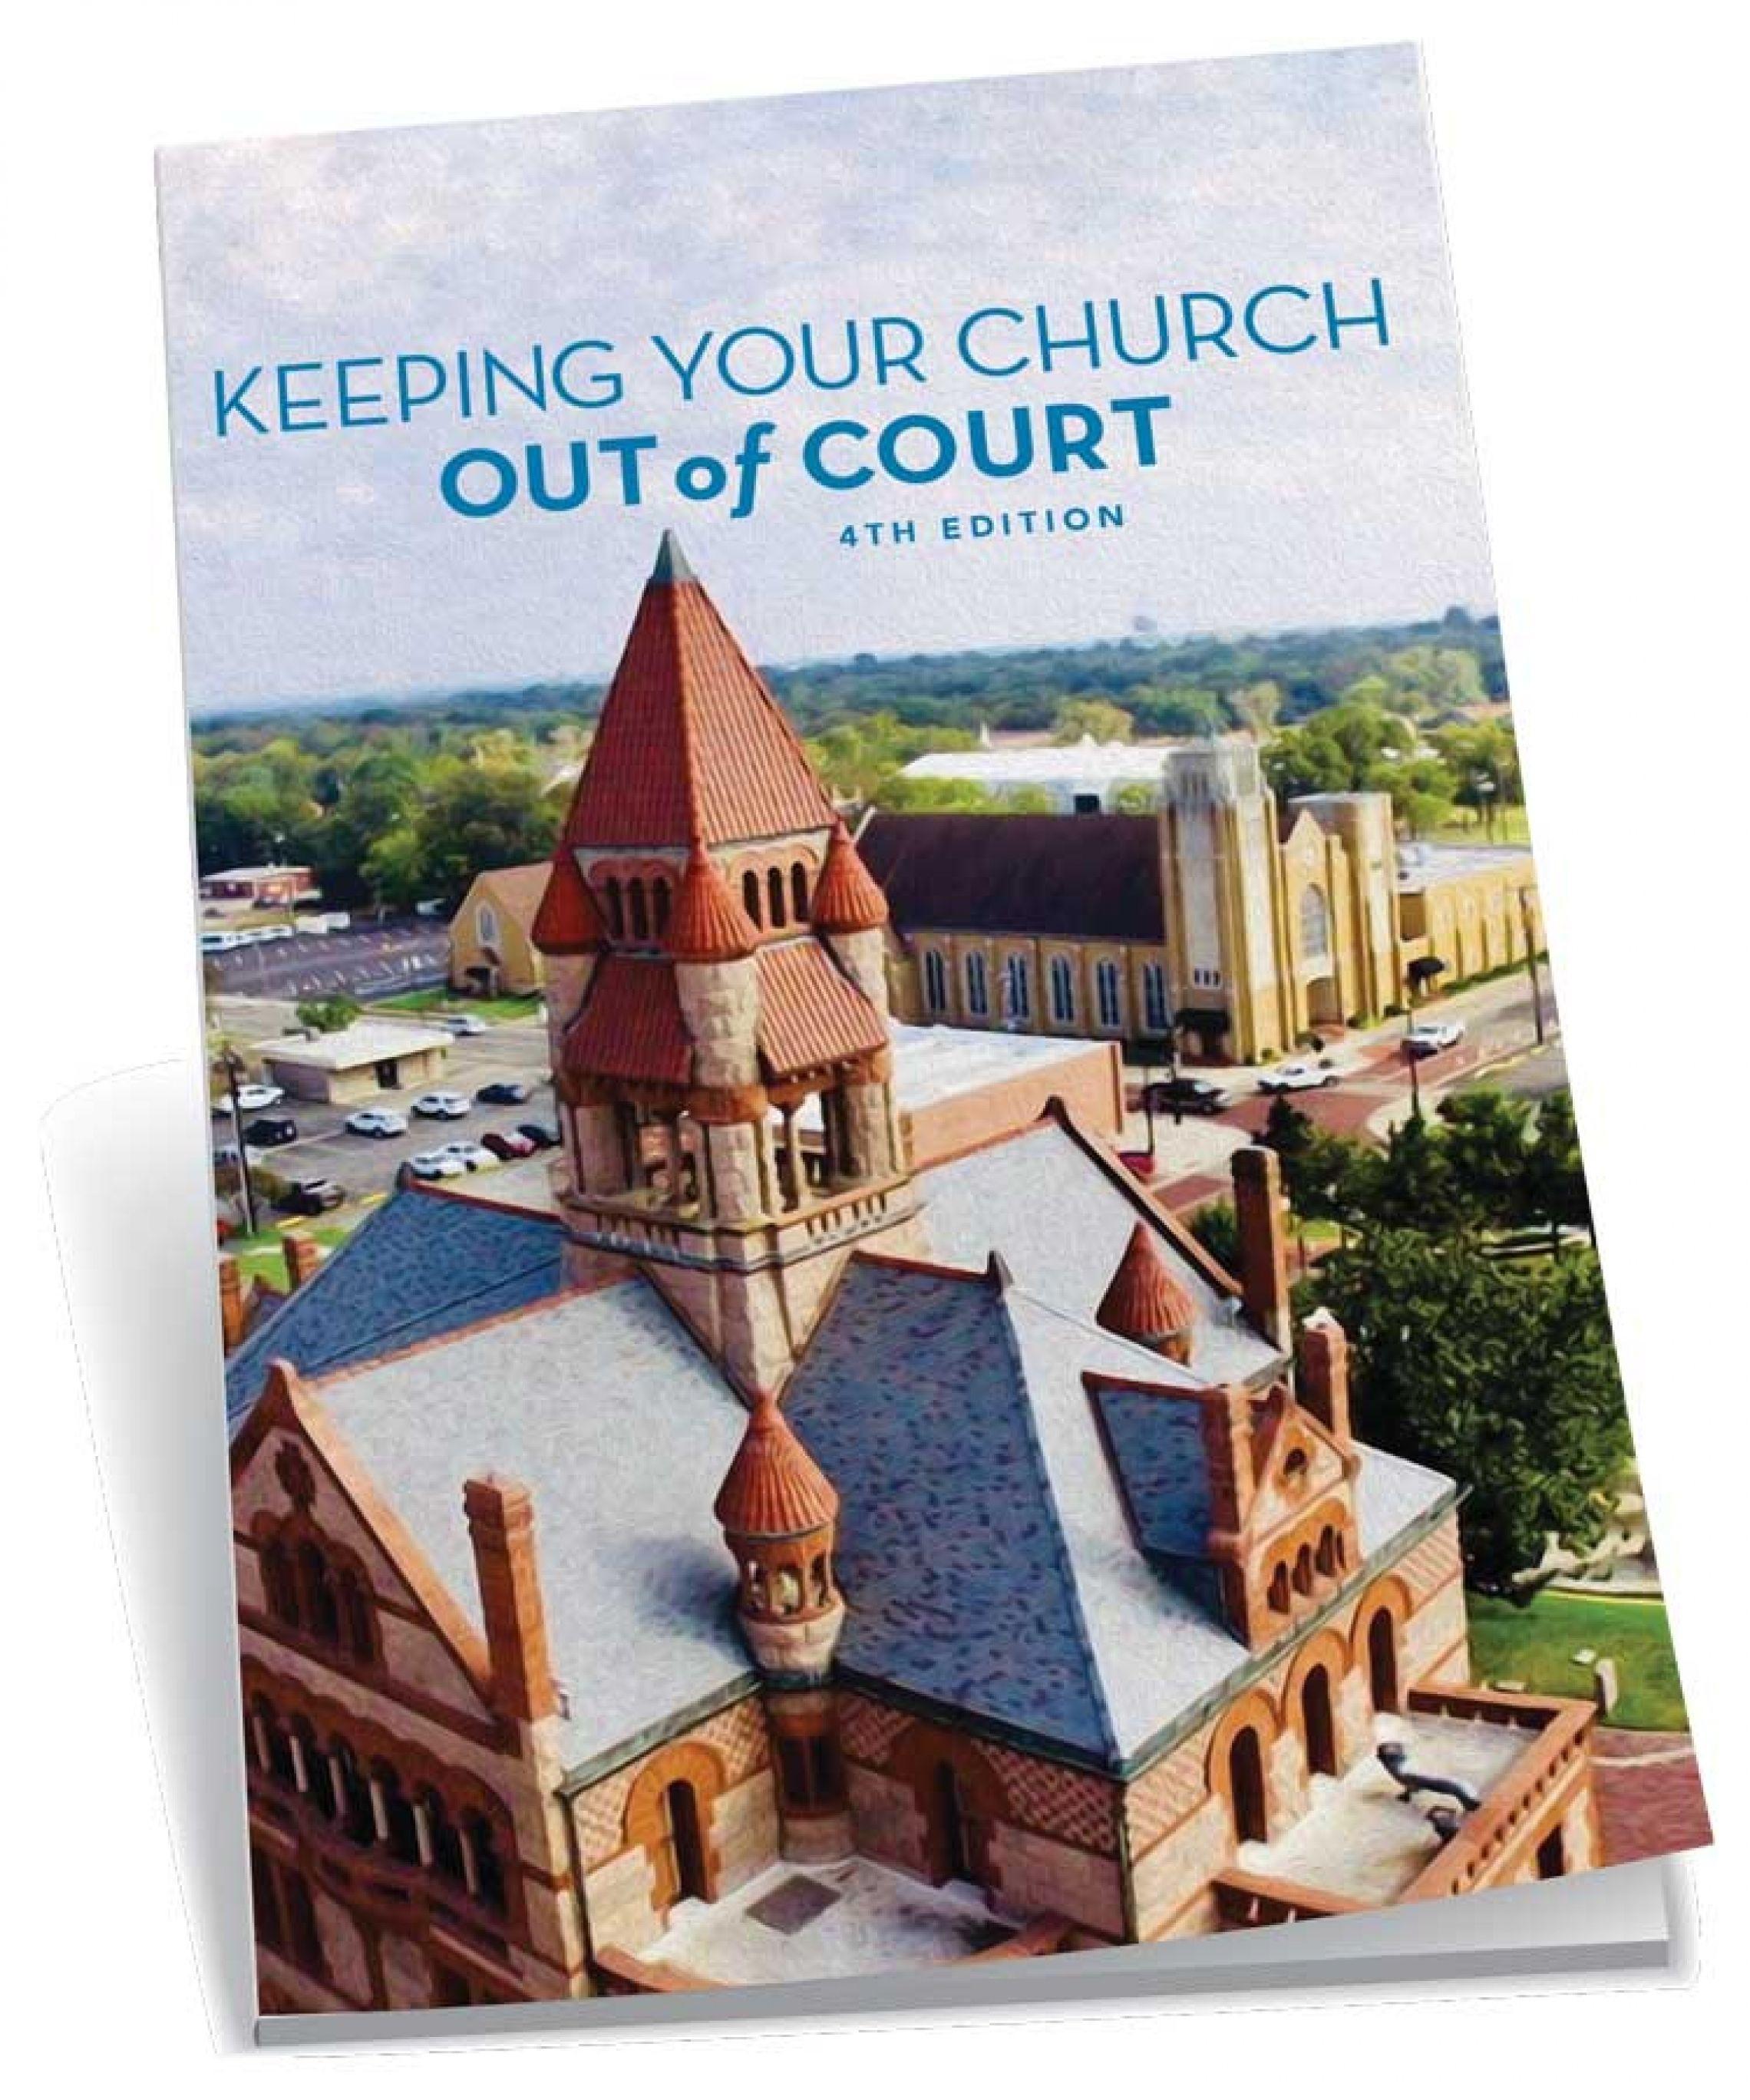 texas baptists church administration kycooc book covers ms church administration church administrator salary church administrator